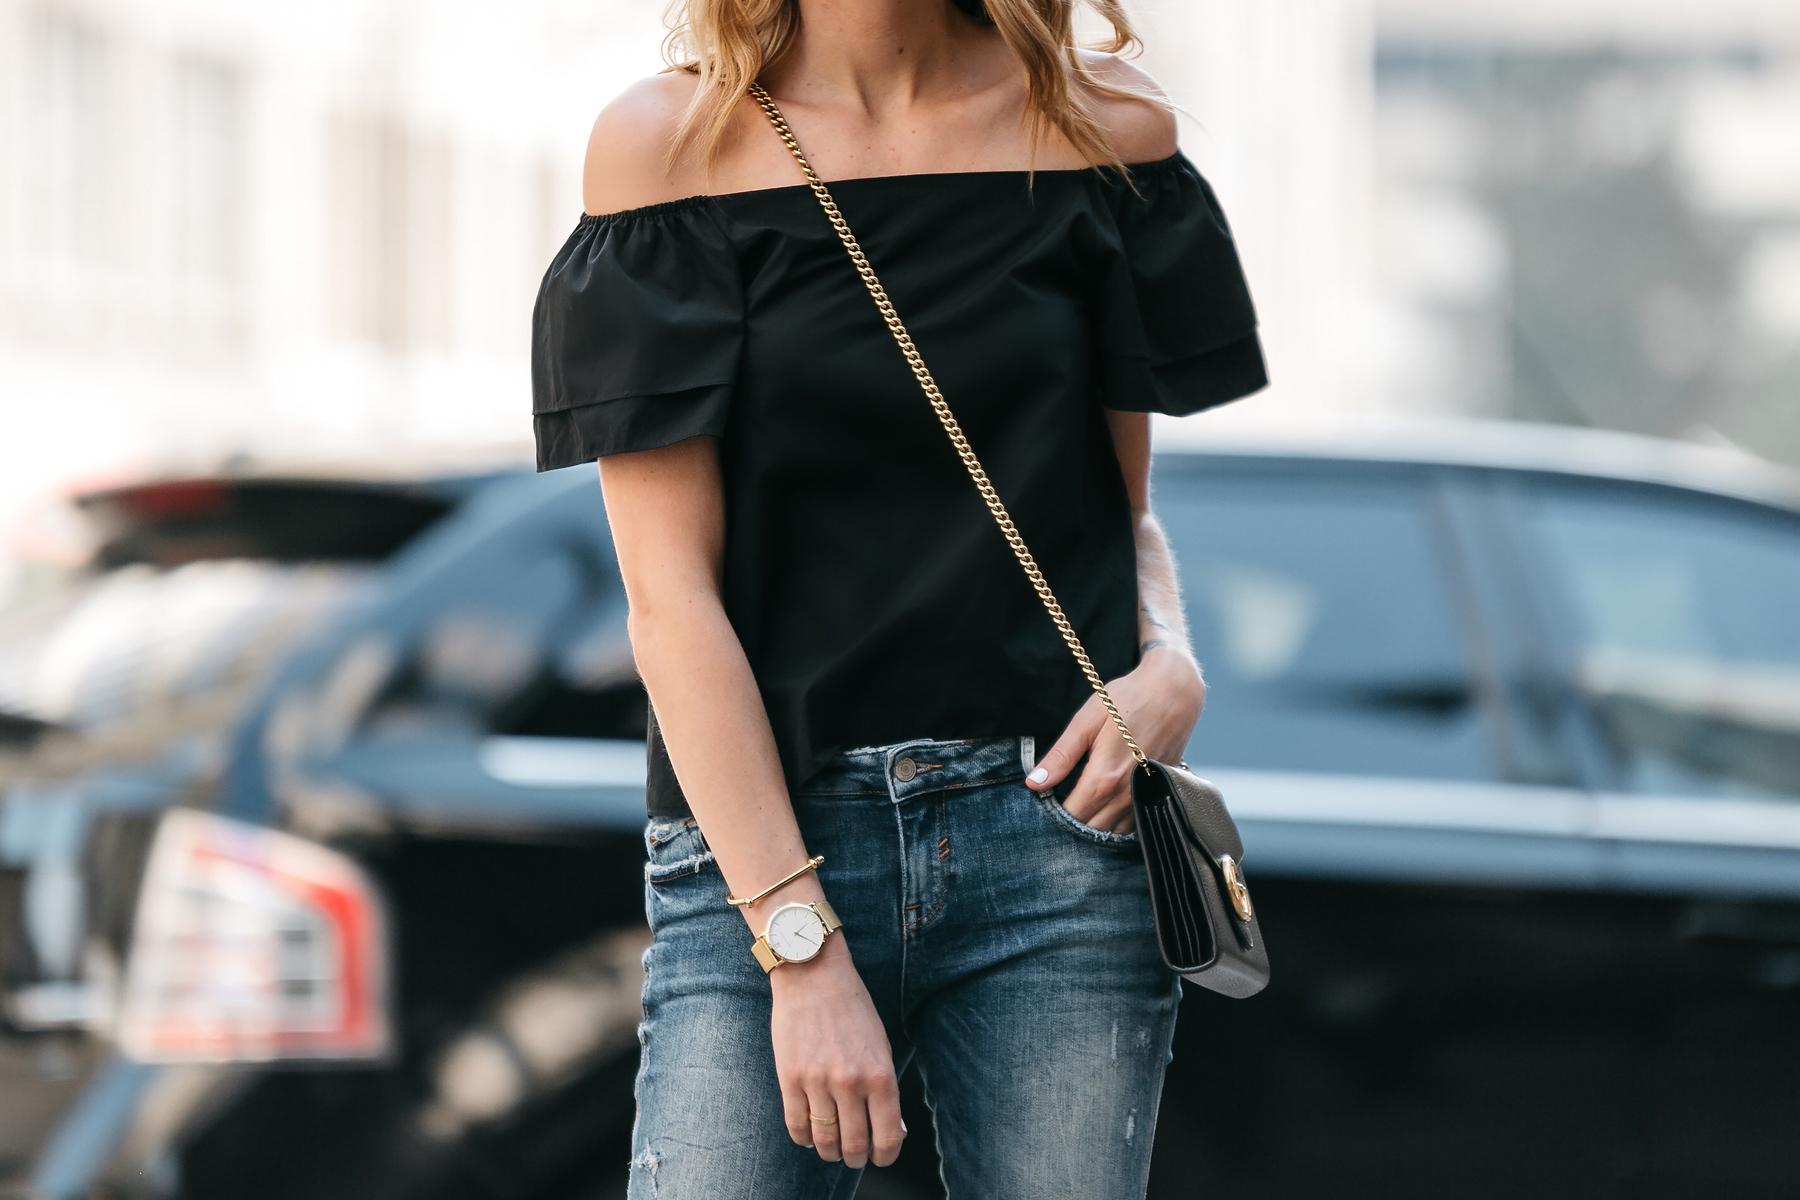 Fashion Jackson, Dallas Blogger, Fashion Blogger, Street Style, Black Short Sleeve Off-the-shoulder top, Zara Denim Ripped Skinny Jeans, Gucci Marmont Handbag